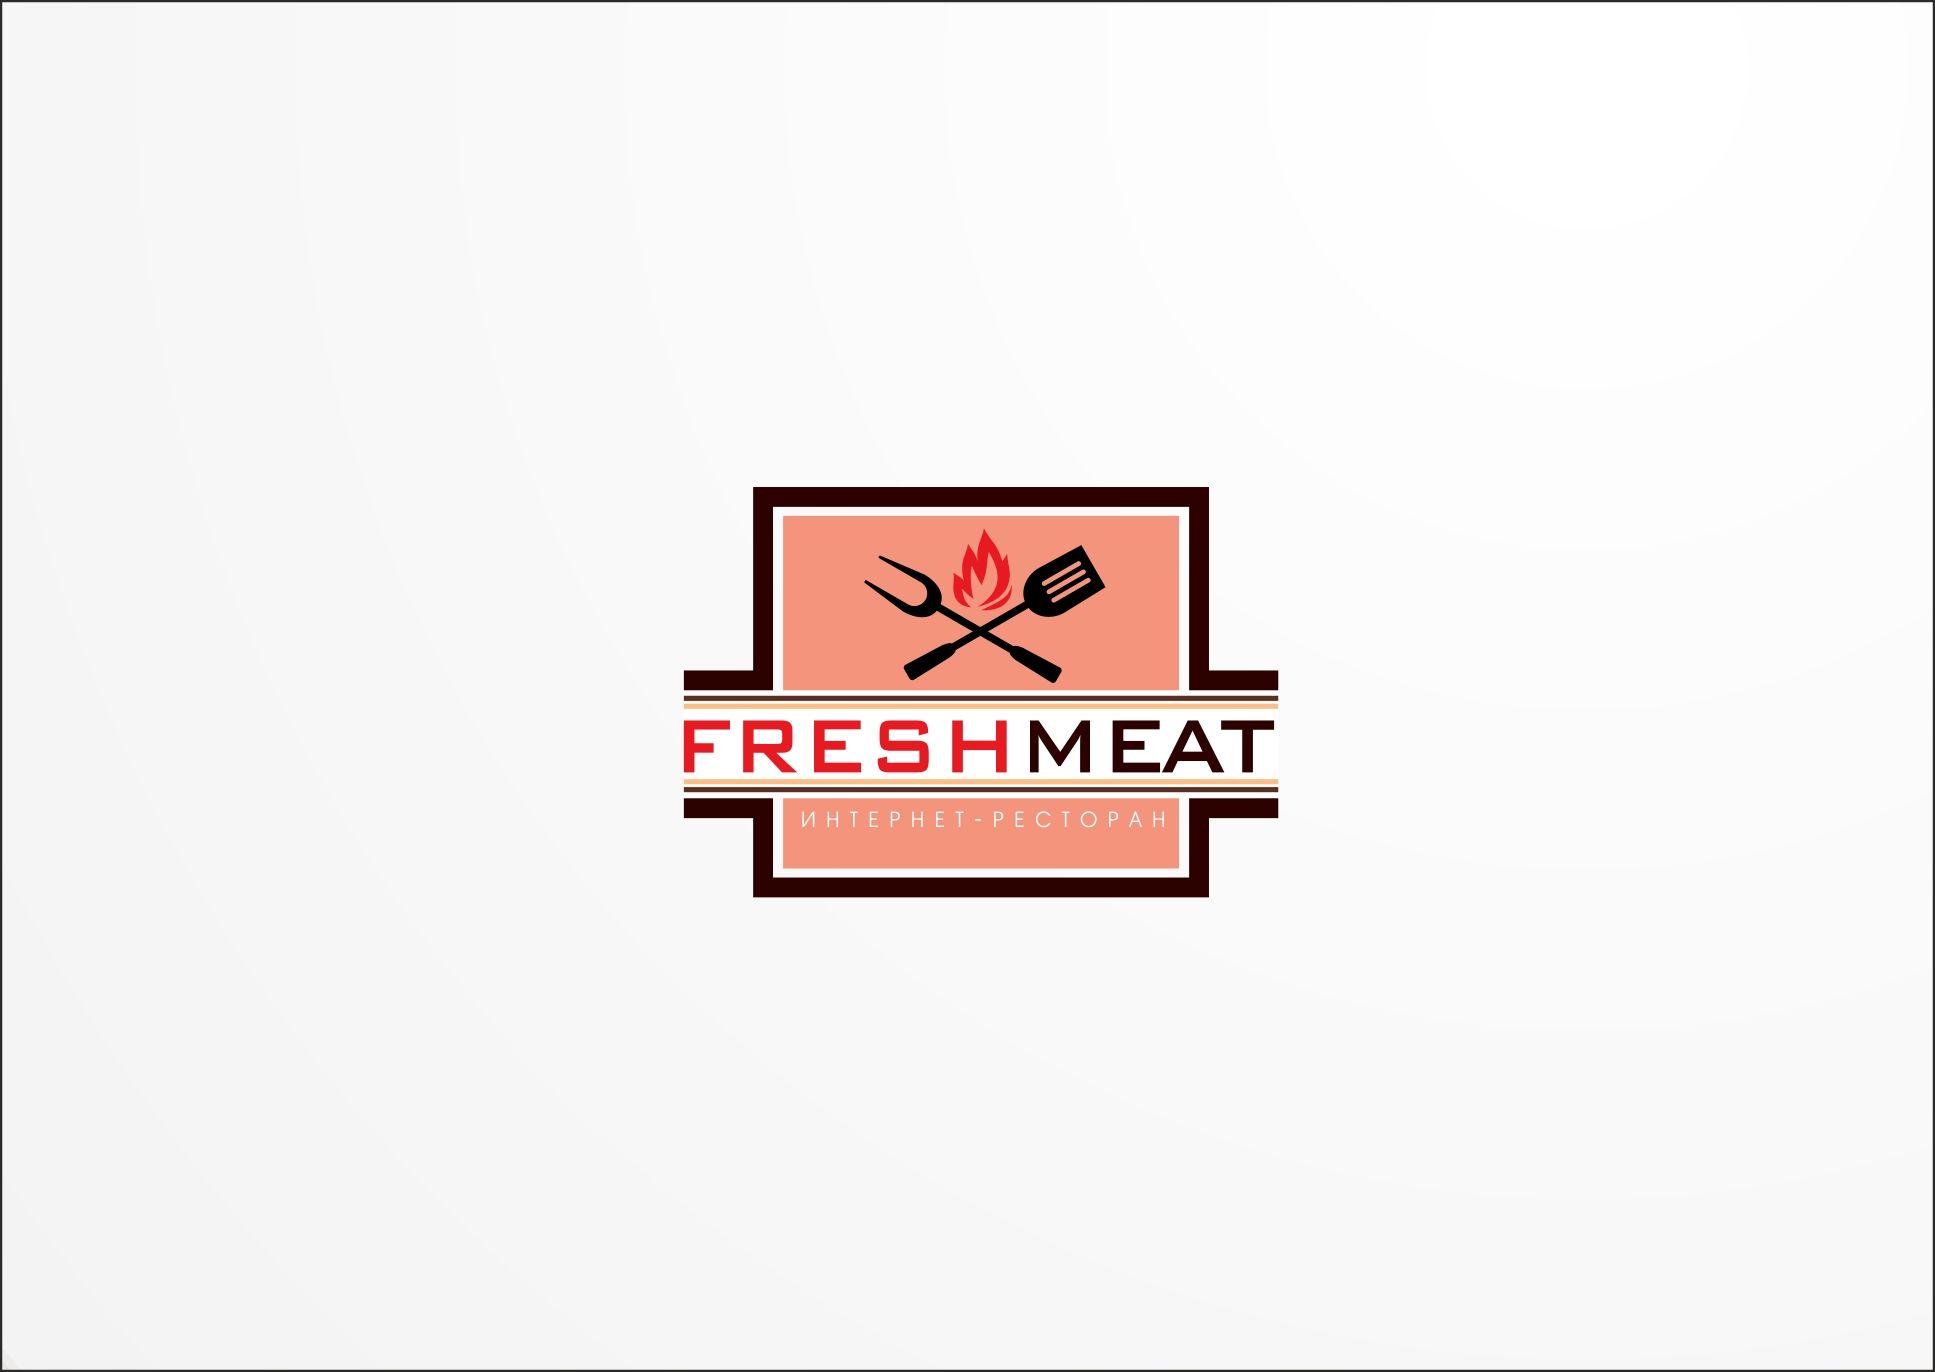 Разработка логотипа и ФС для интернет-ресторана - дизайнер ElenaCHEHOVA